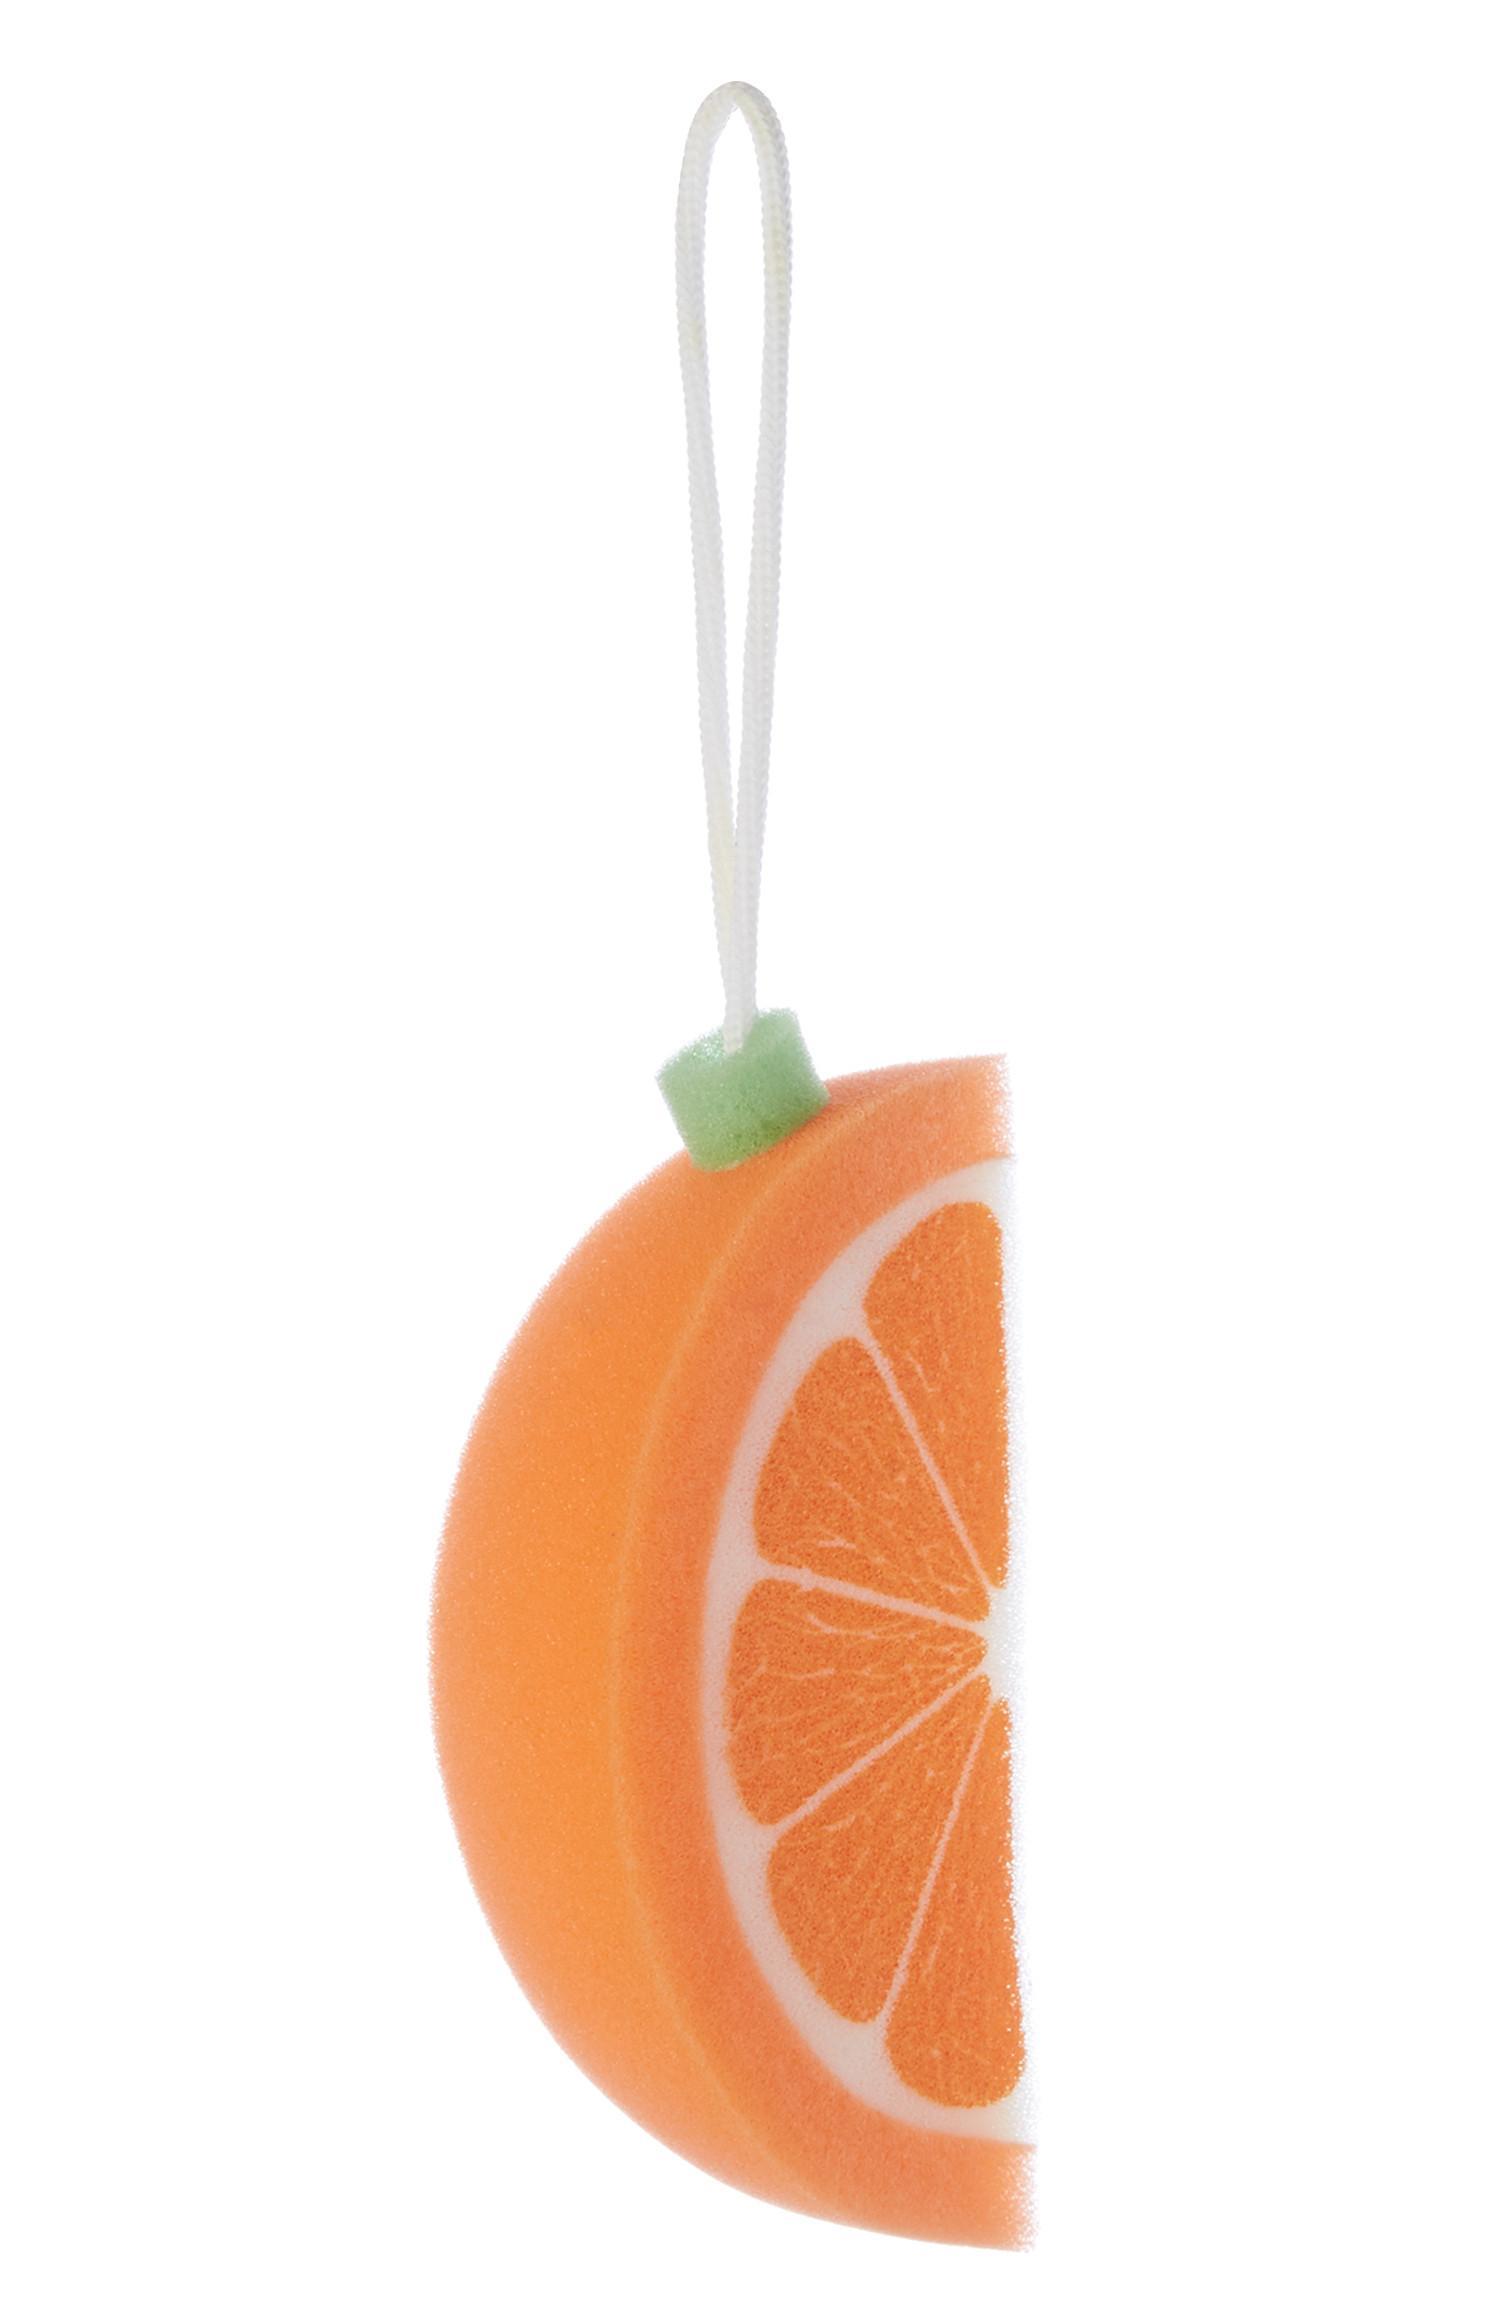 Esponja cor de laranja